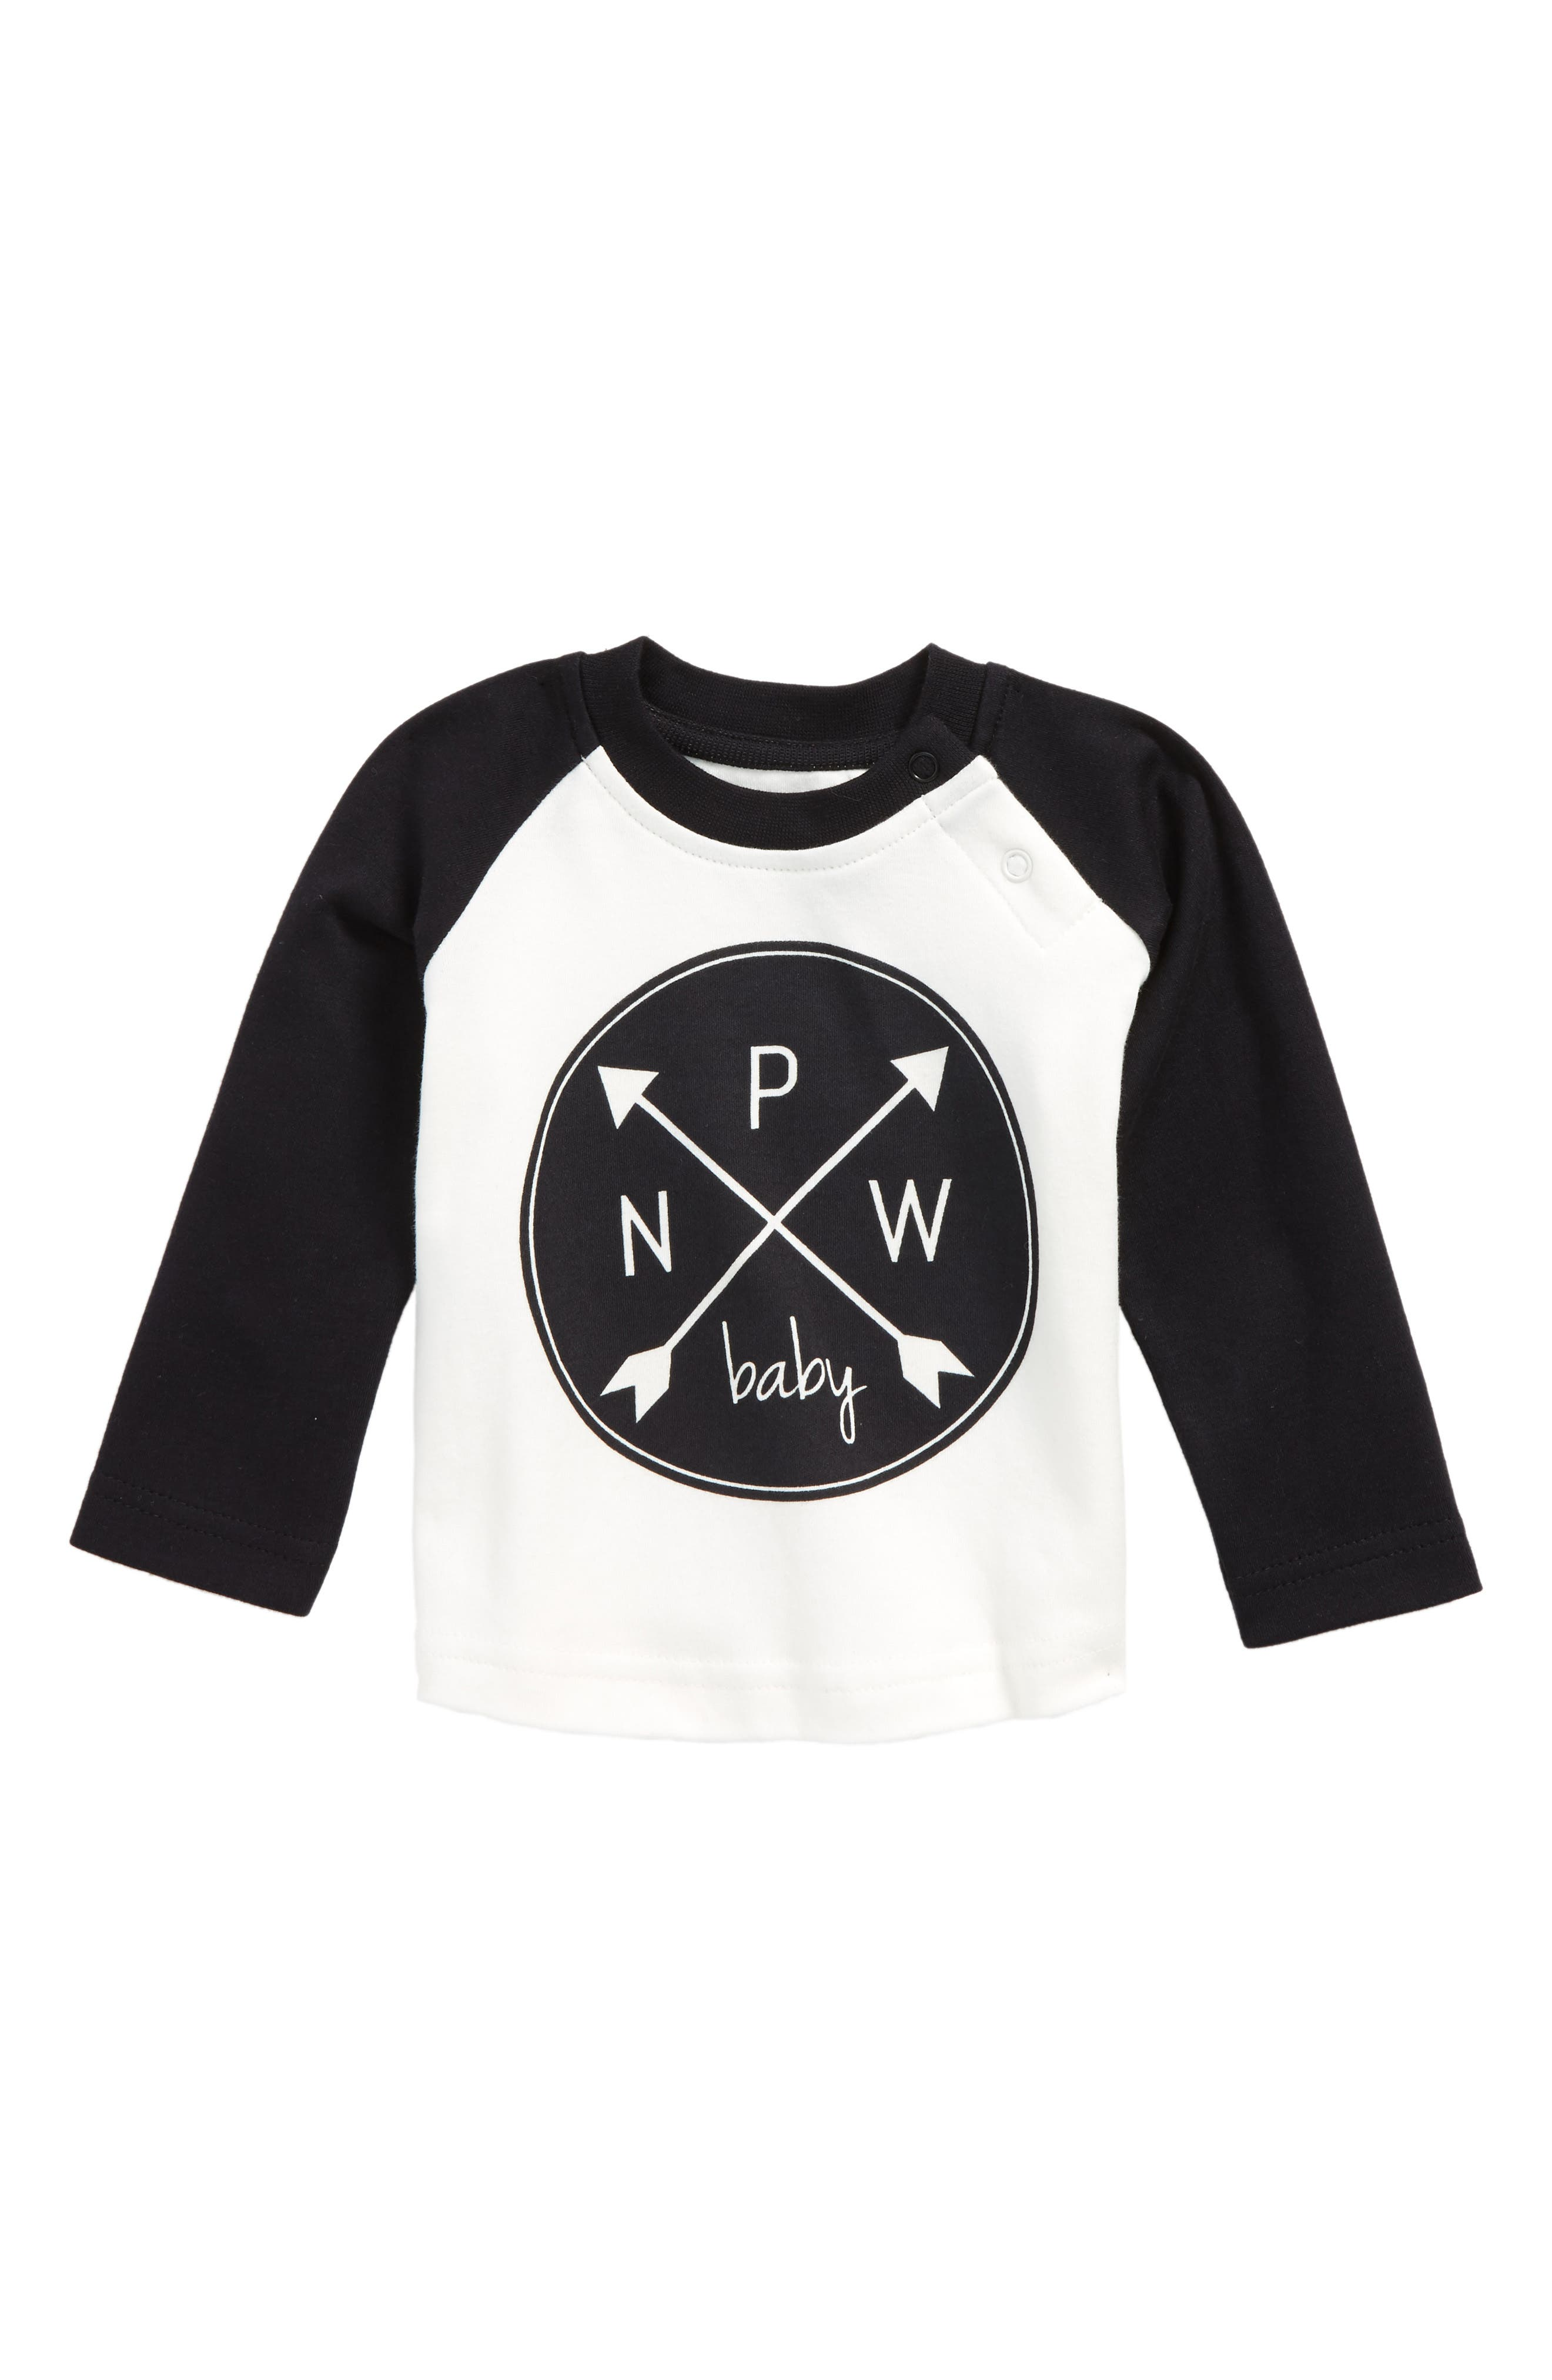 PNW Logo Organic Cotton T-Shirt,                             Main thumbnail 1, color,                             BLACK/ OFFWHITE